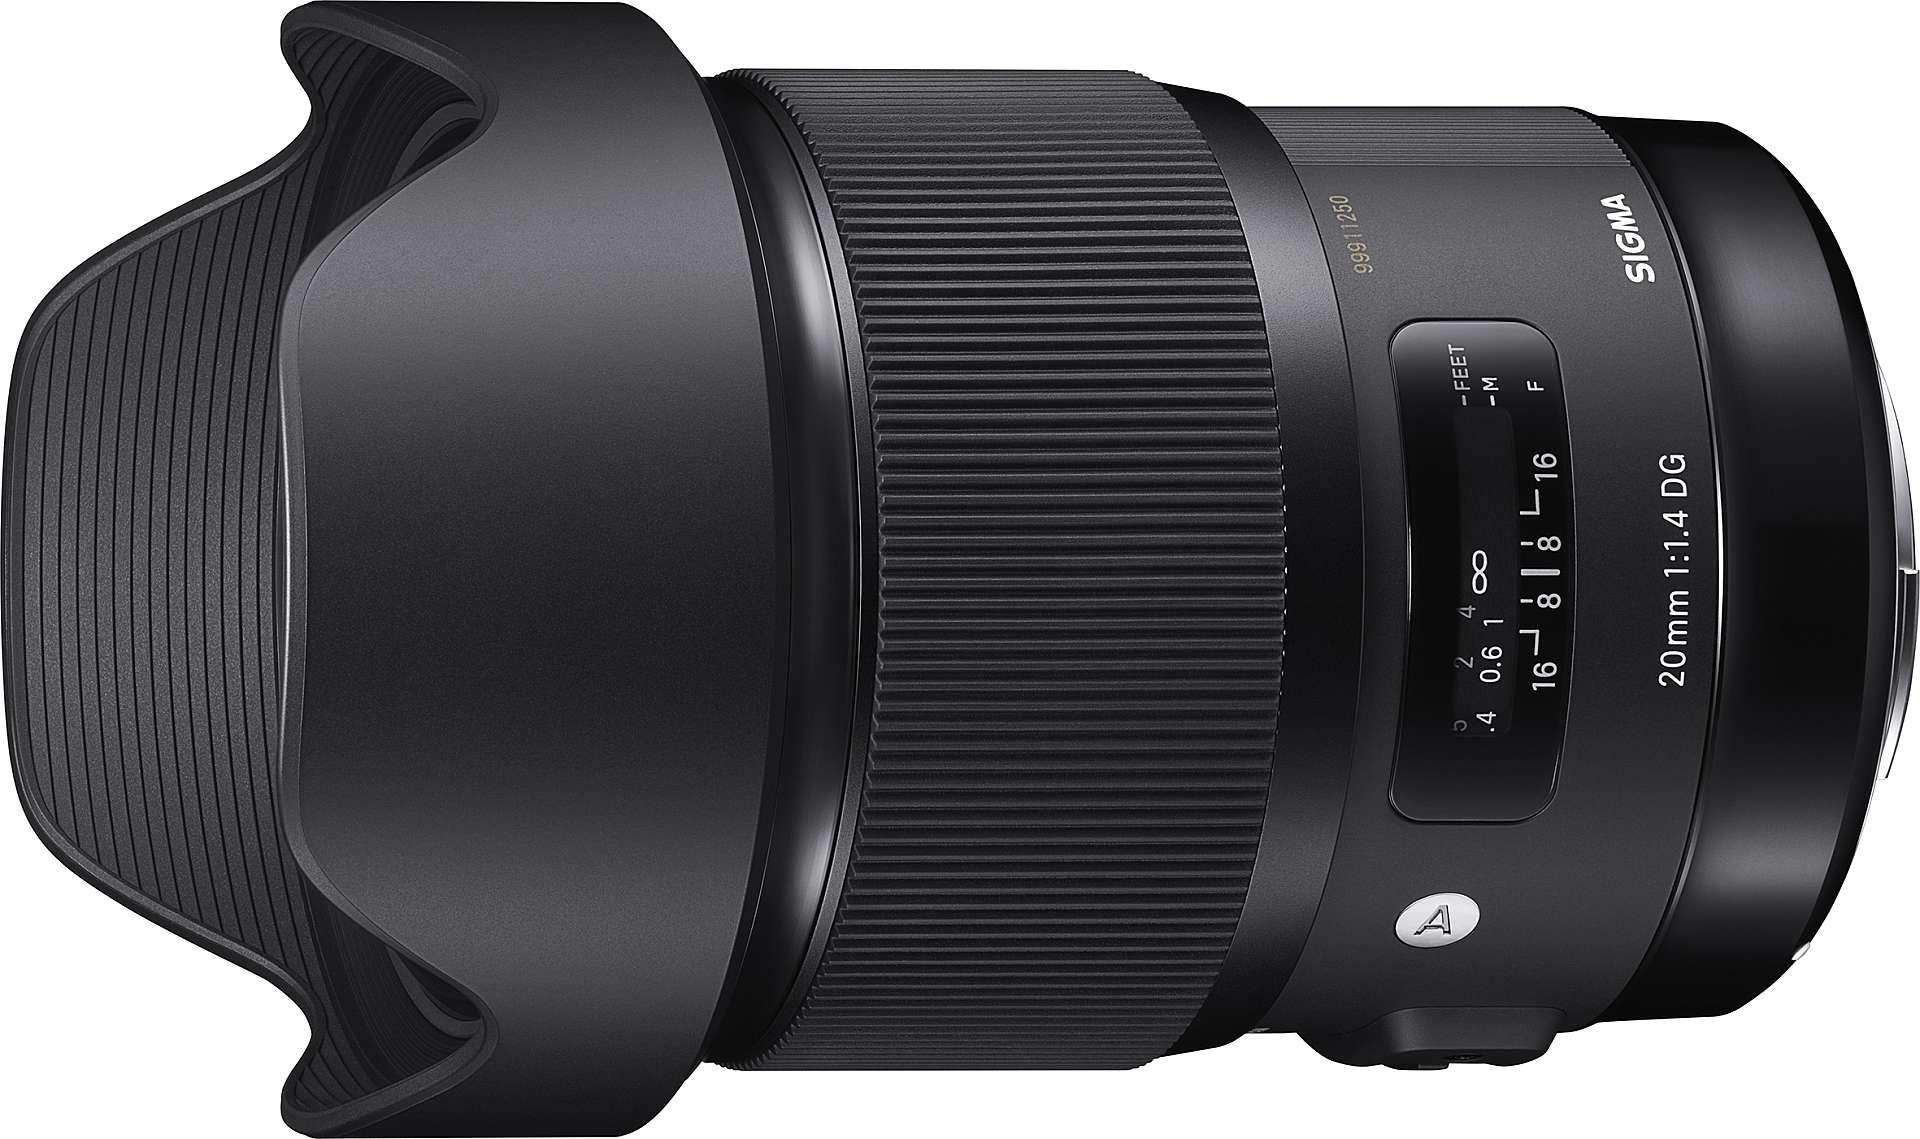 SIGMA 20mm F1.4 GD HSM A | Art mot vit bakgrund